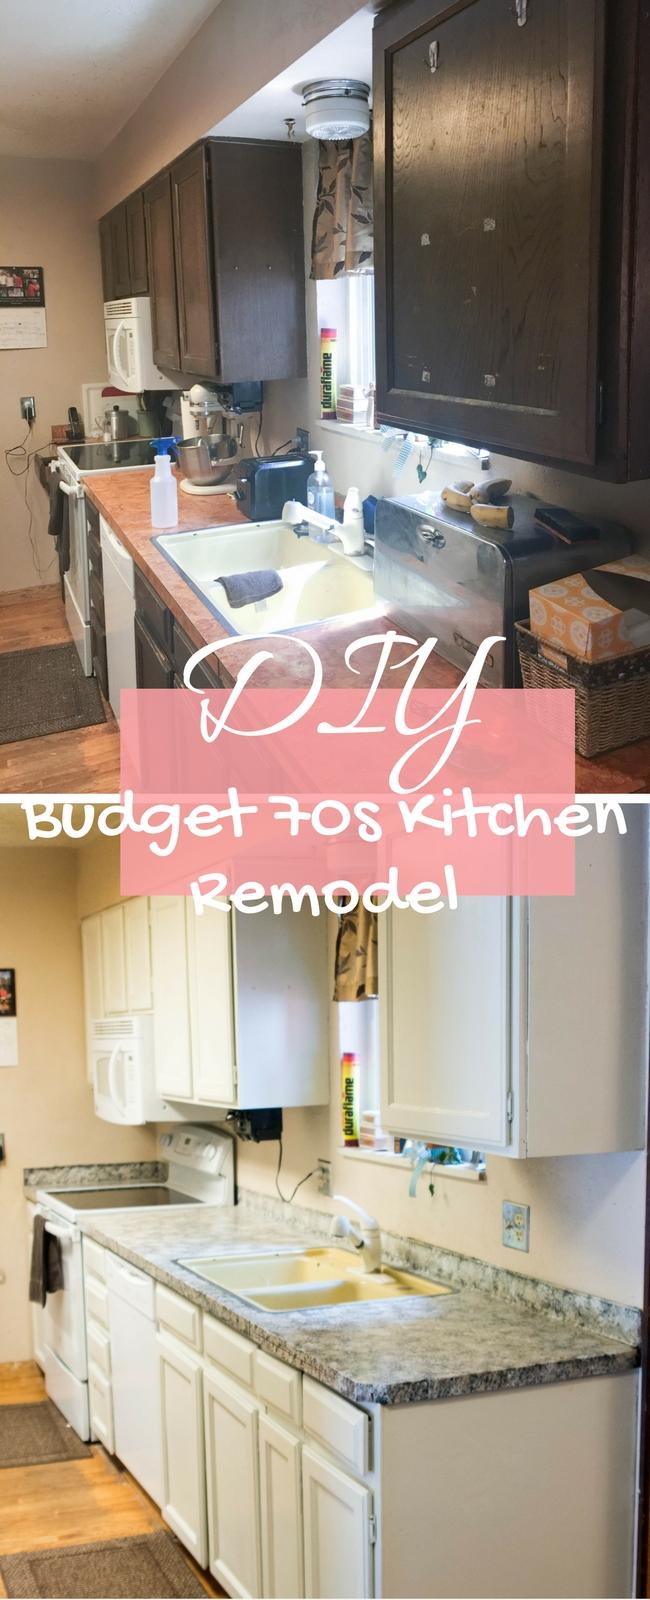 Budget 70s Kitchen Remodel